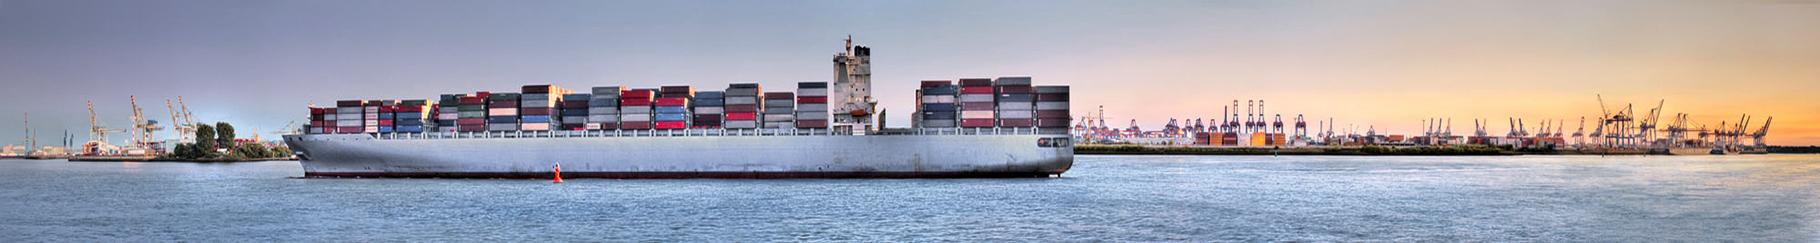 Schiff vor Waltershof · 295 x 40 cm · Leinwand auf Keilrahmen: € 980,- · Aludibond: € 1.230,- · Acrylglas auf Aludibond: € 1.570,-  · © Stefan Korff